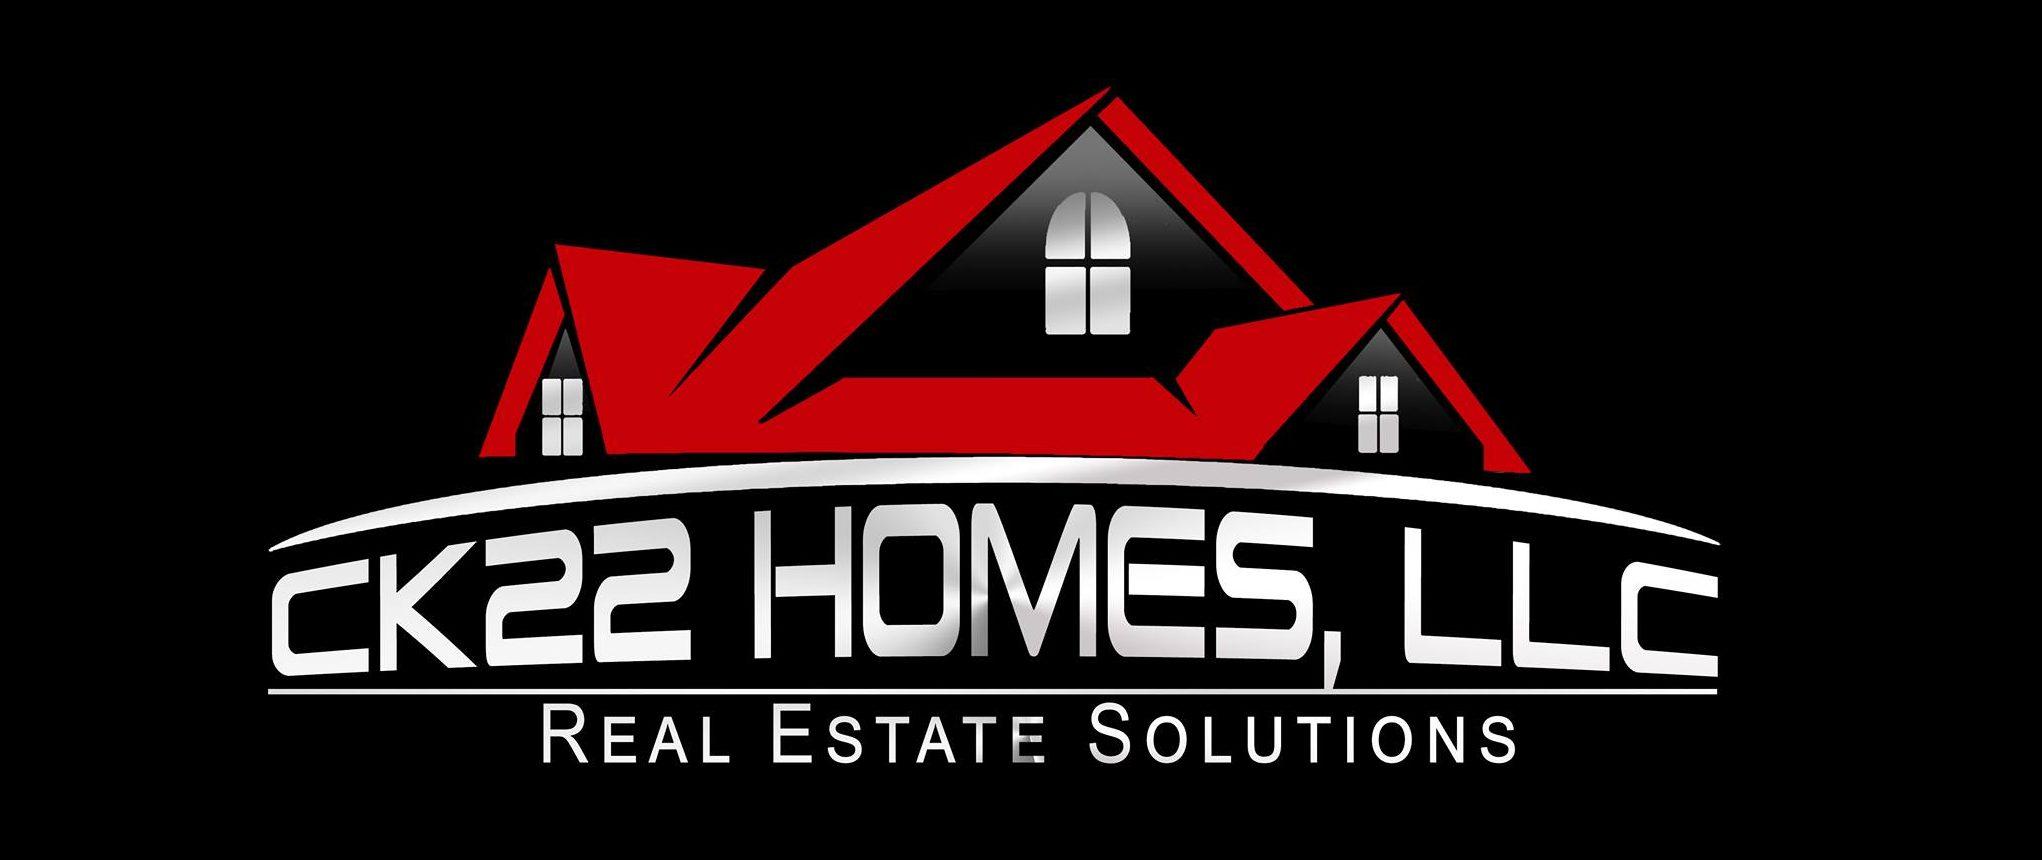 CK22 Homes, LLC